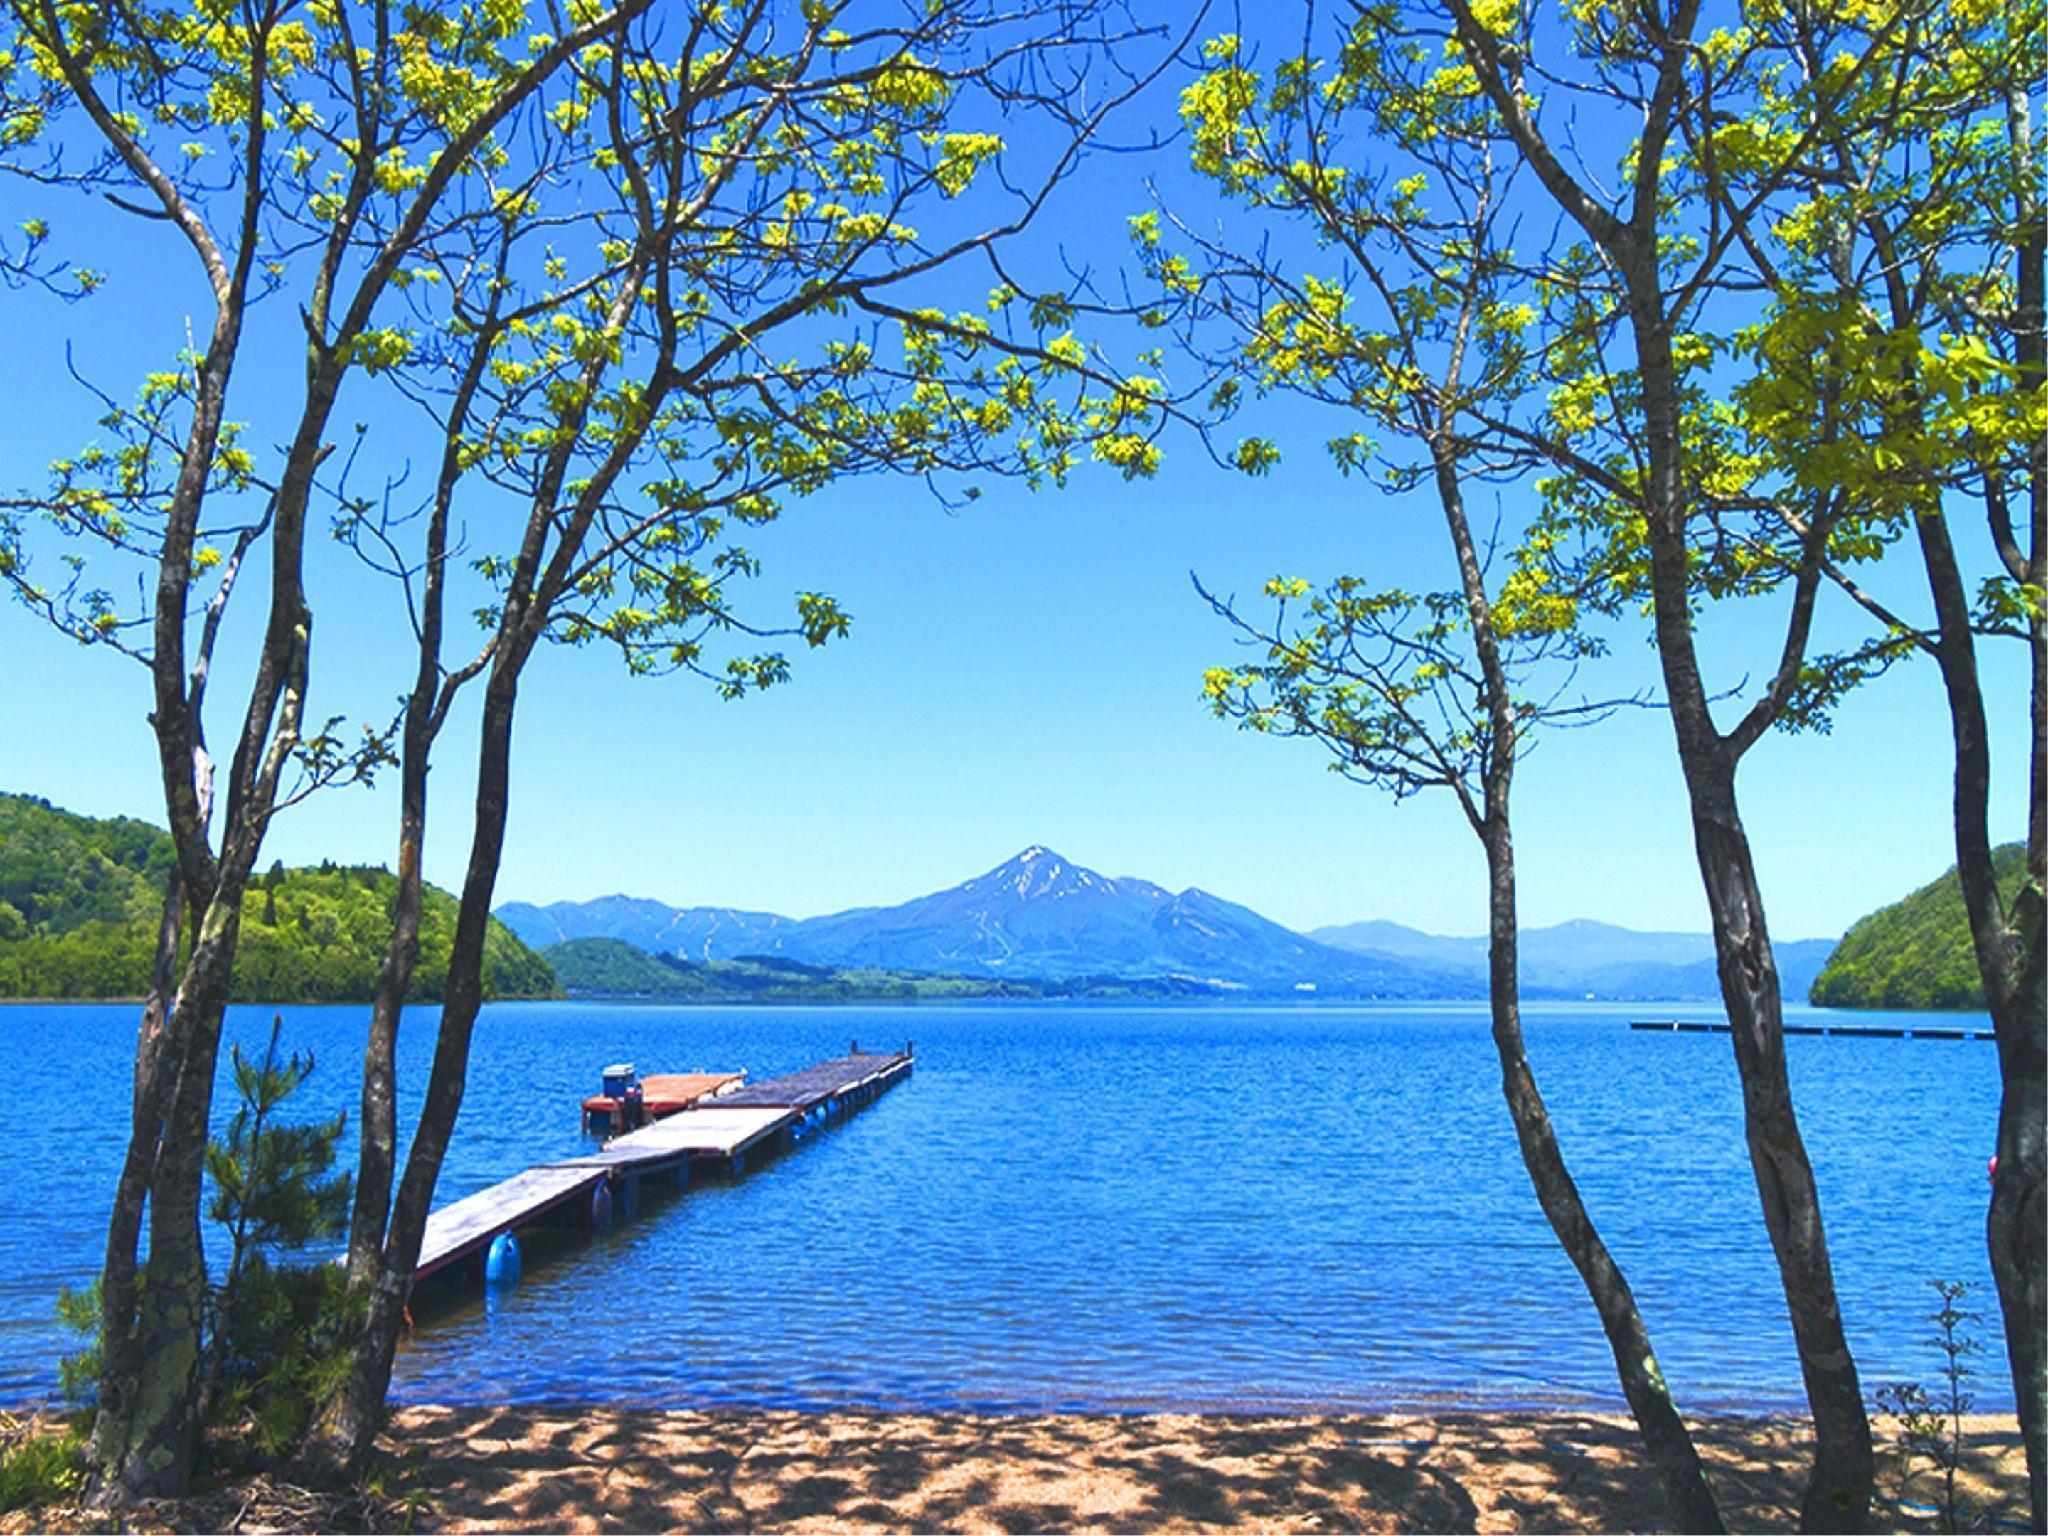 Lake Side Hotel Minatoya